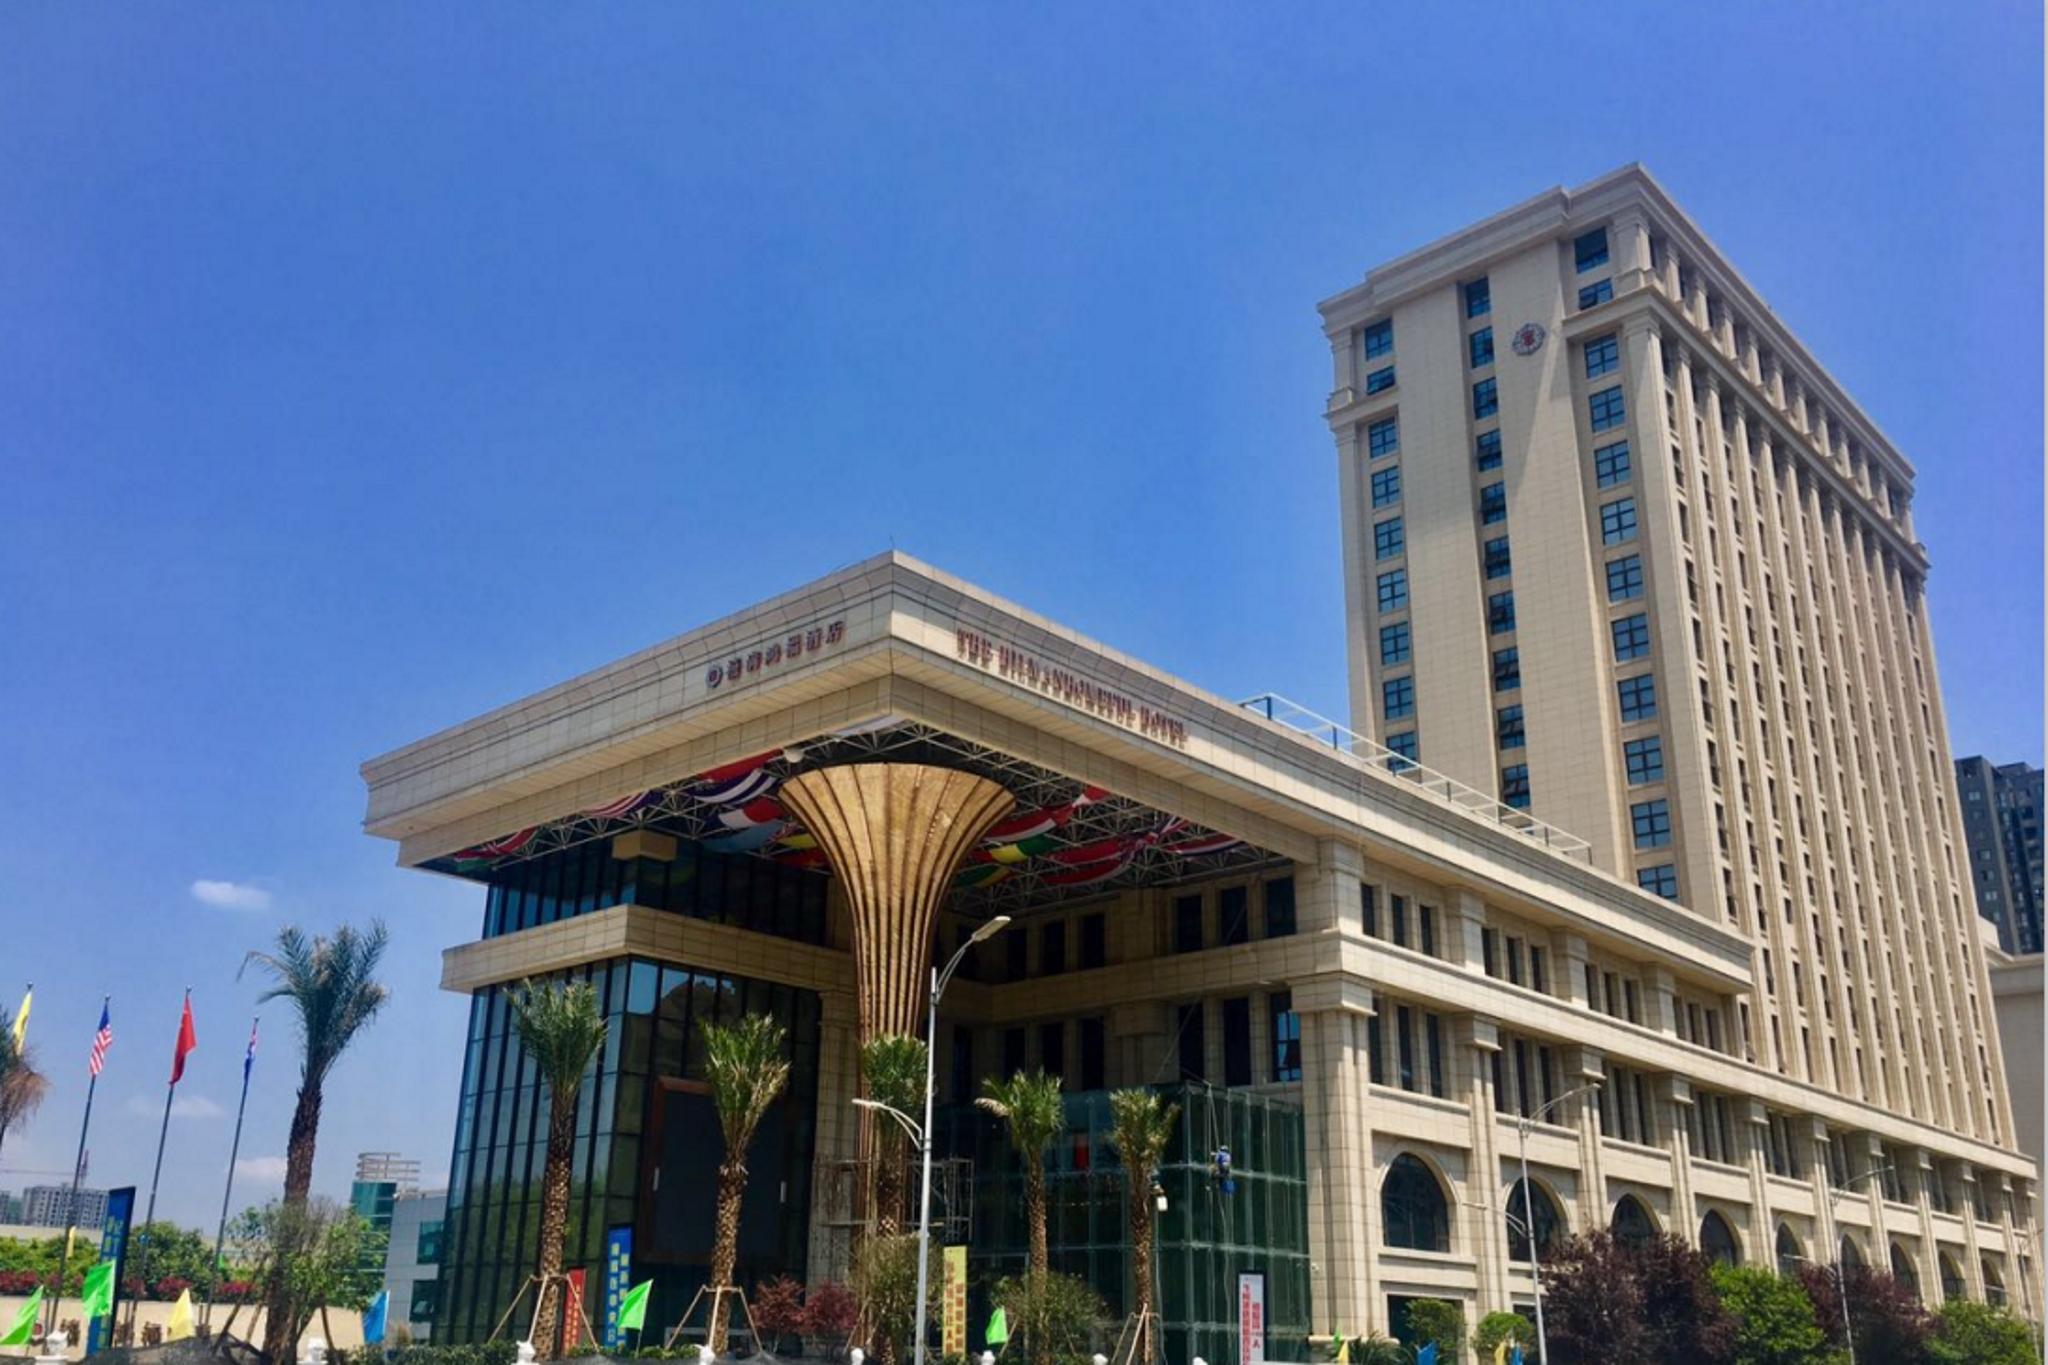 Hilmanhomeful Hotel